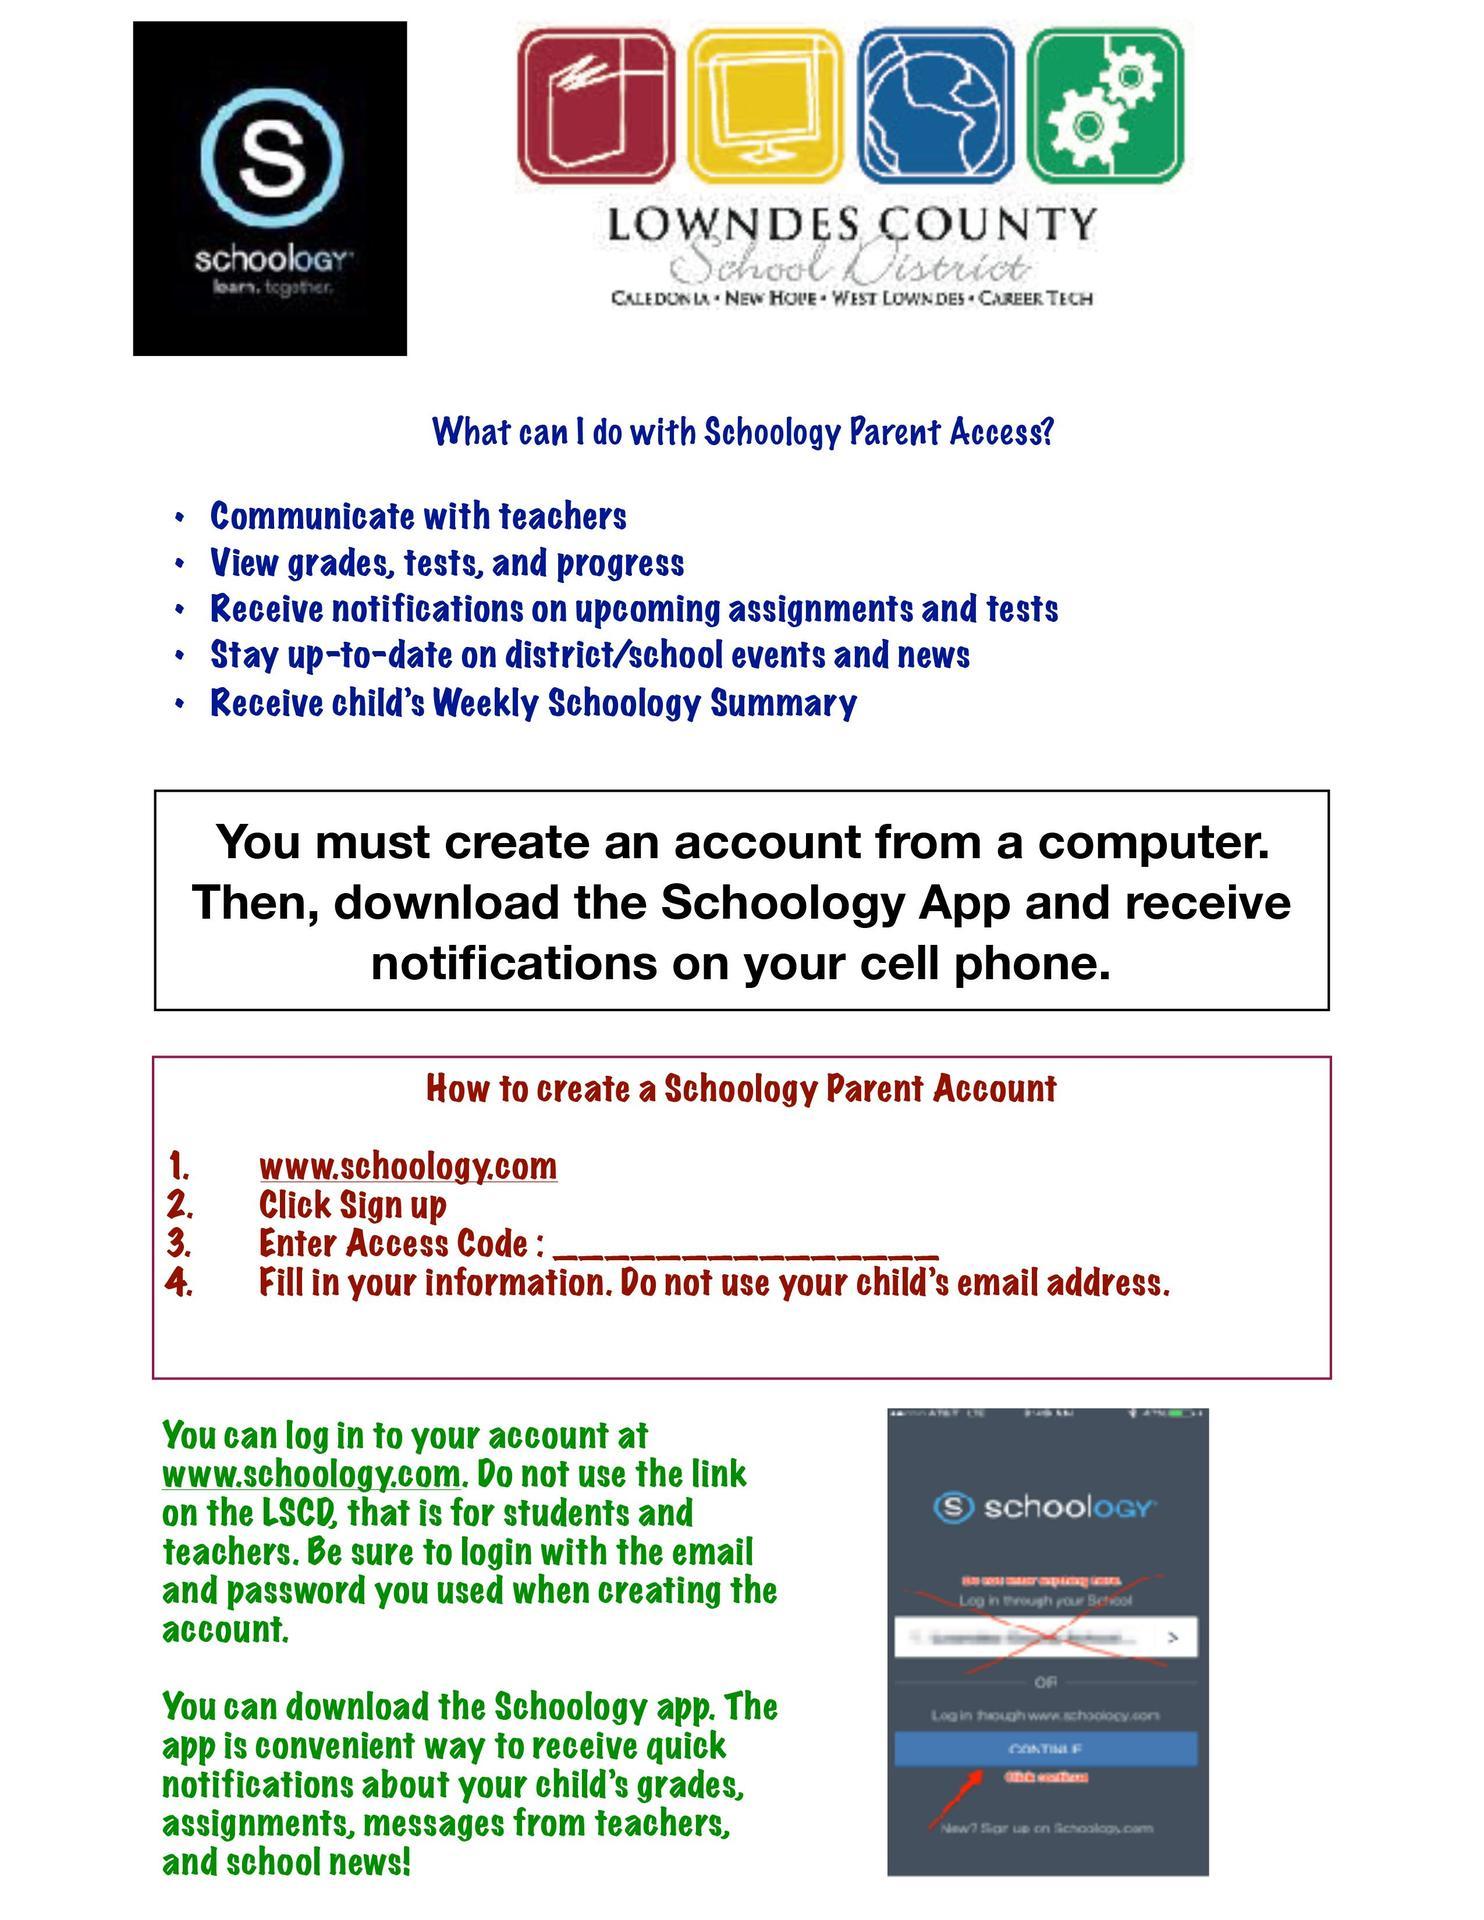 schoology site info